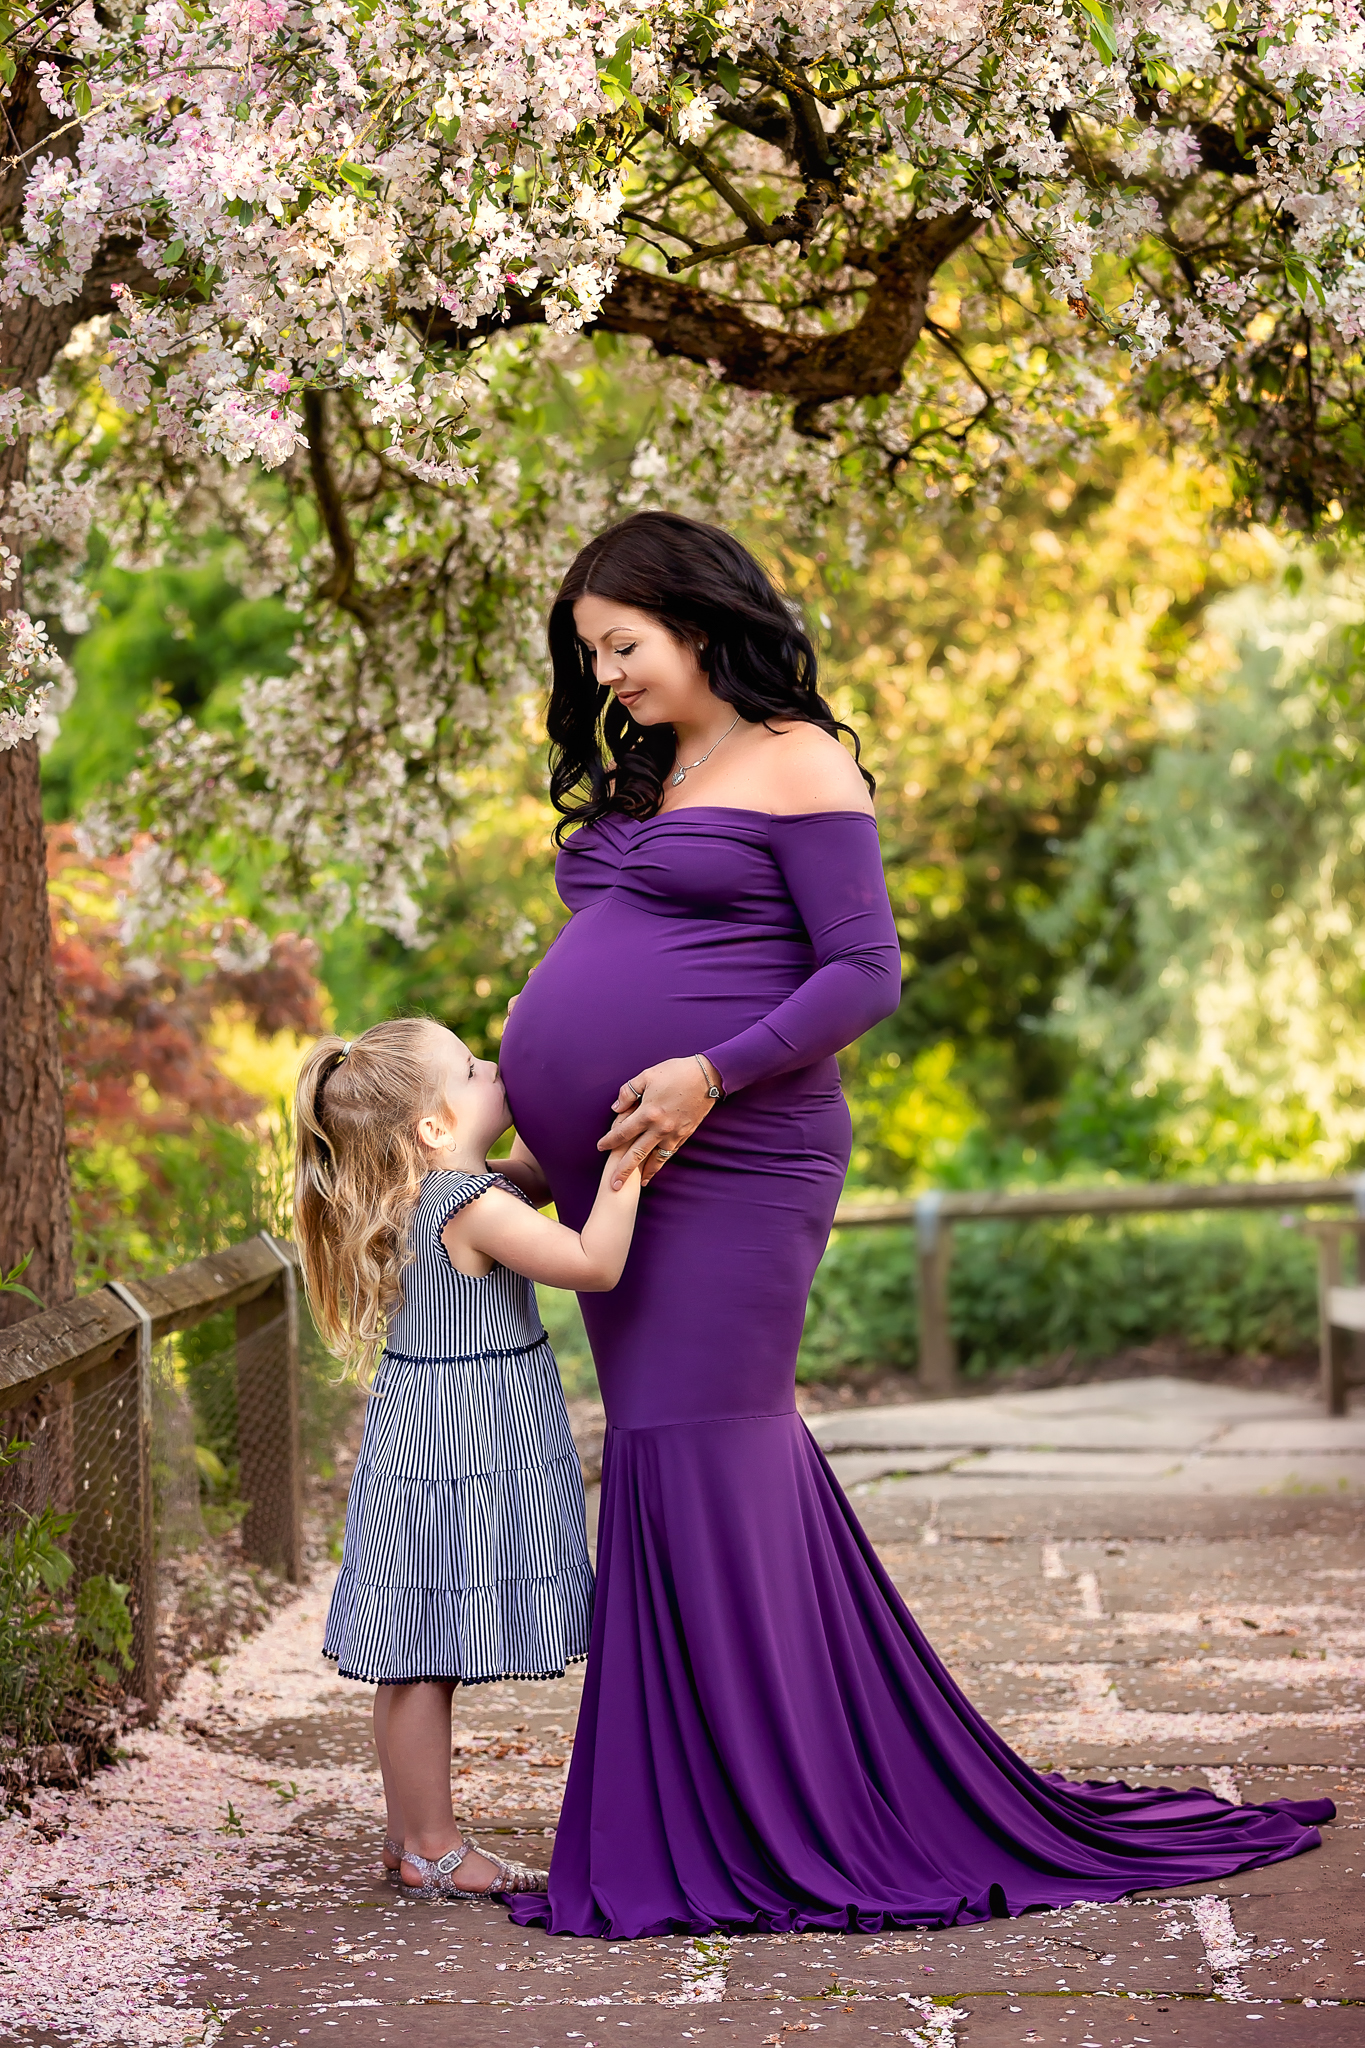 Leeds maternity photography